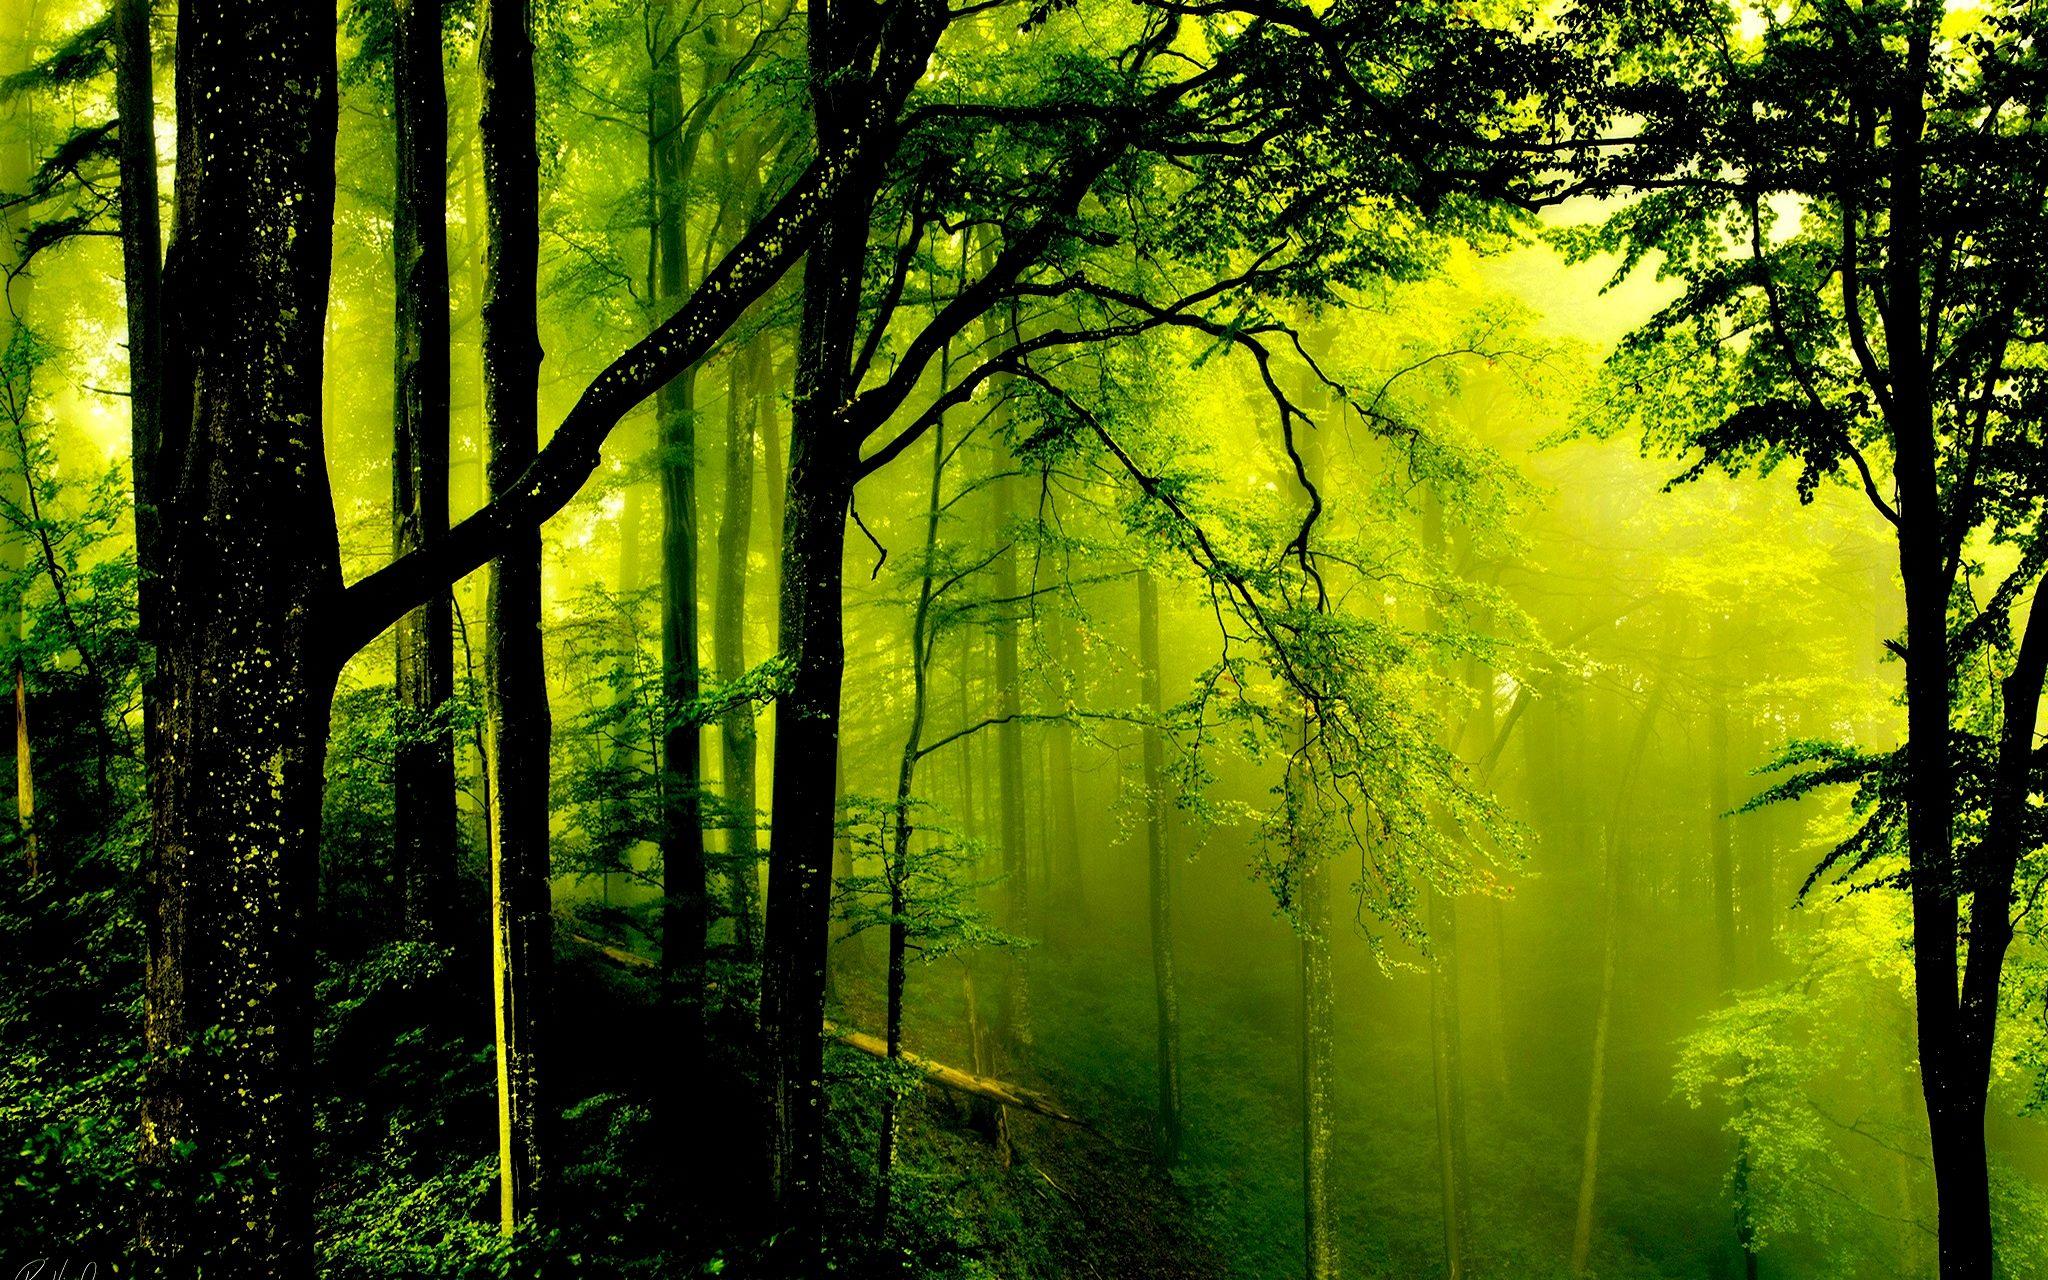 Green Forest Wallpaper | 2048x1280 | ID:48891 - WallpaperVortex.com